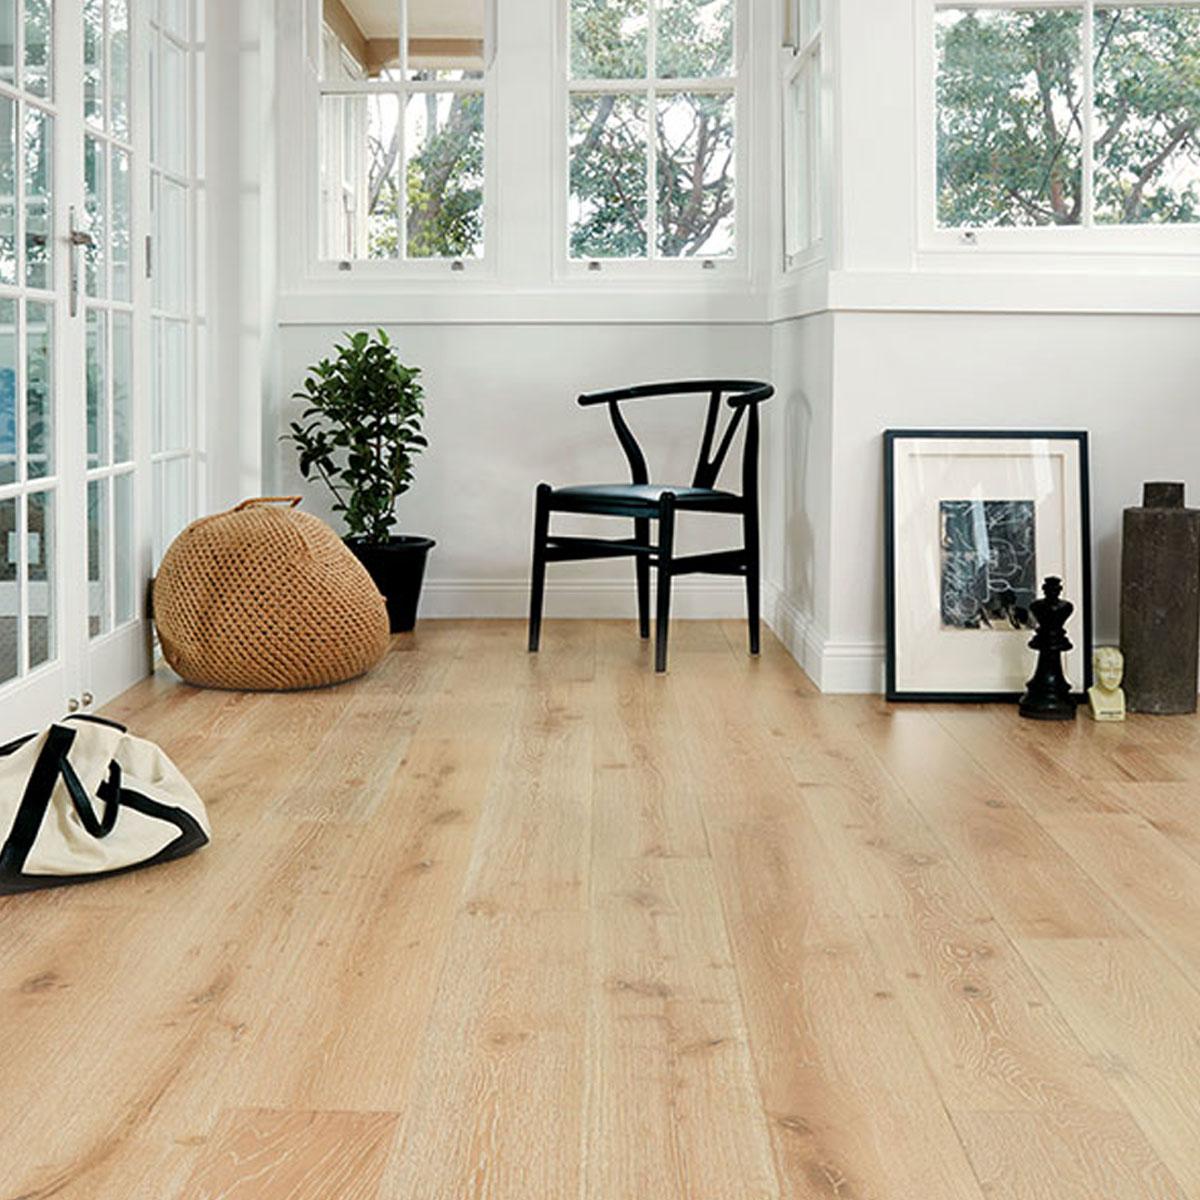 Prestige Oak - Limewash - 15mm Engineered Timber Flooring - Stone3 Brisbane